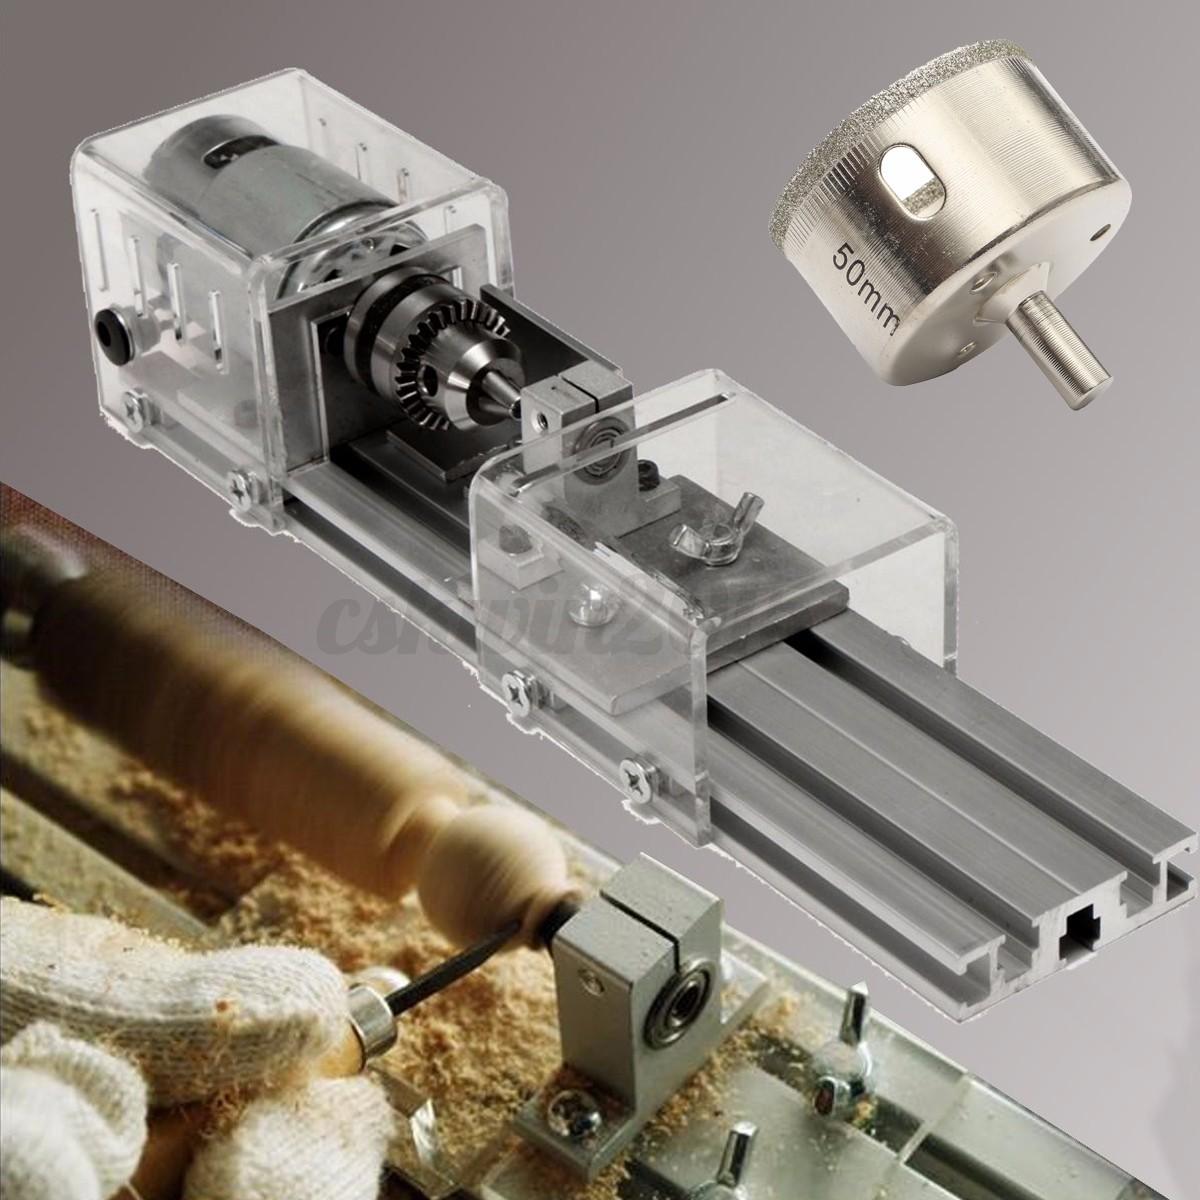 24V Lathe Beads Polisher Machine Woodworking + 15PC Diamond Drill Bits ...